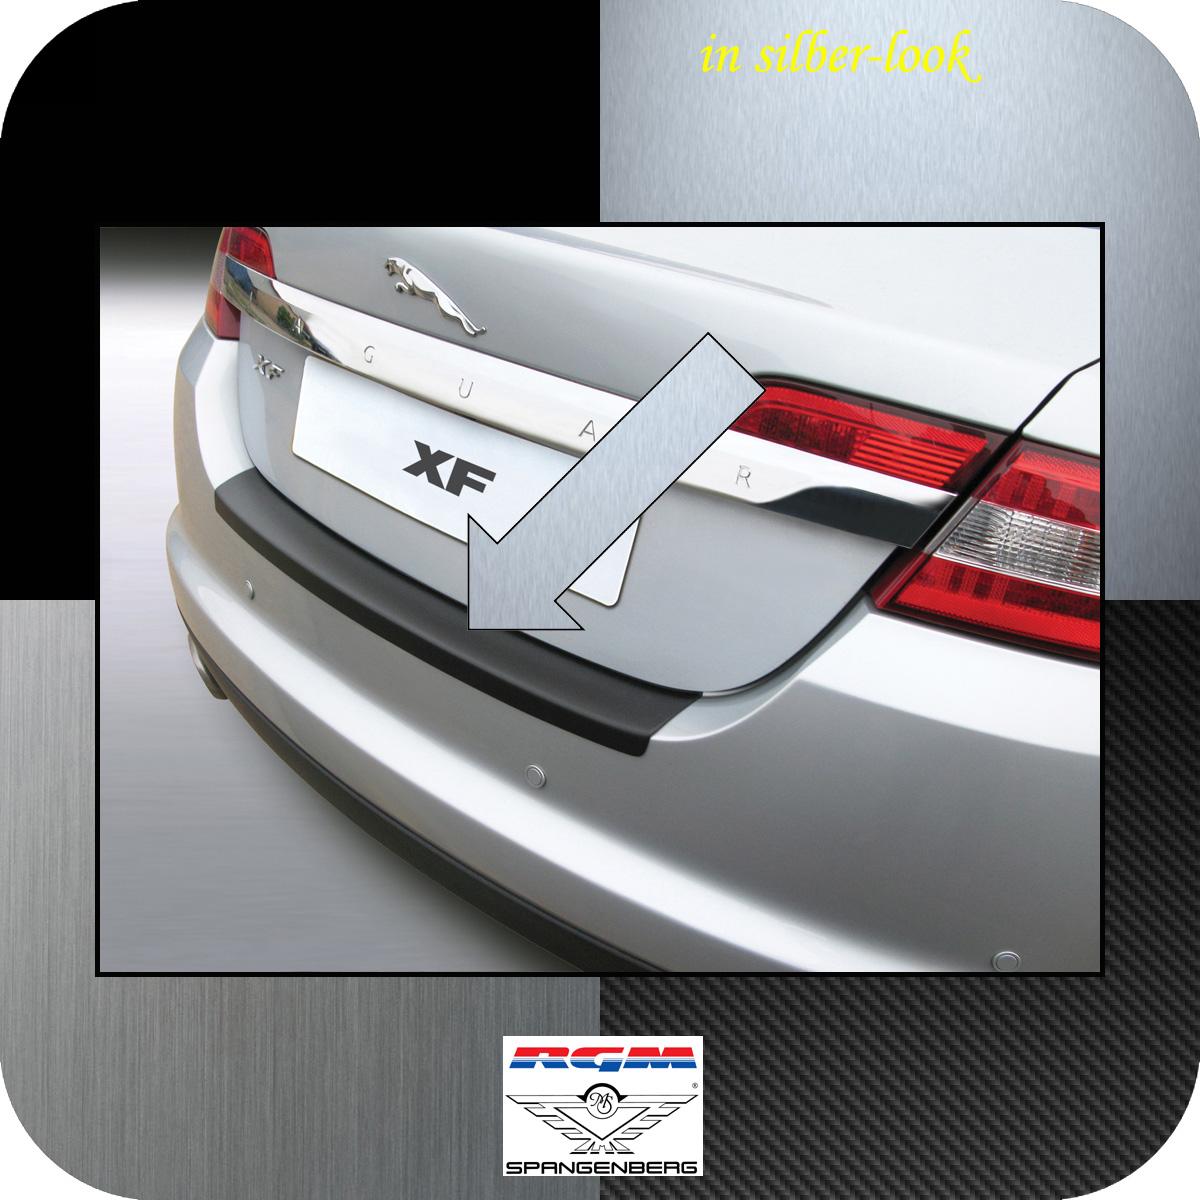 Ladekantenschutz Silber-Look Jaguar XF I X250 Limousine Baujahre 2008-15 3506392